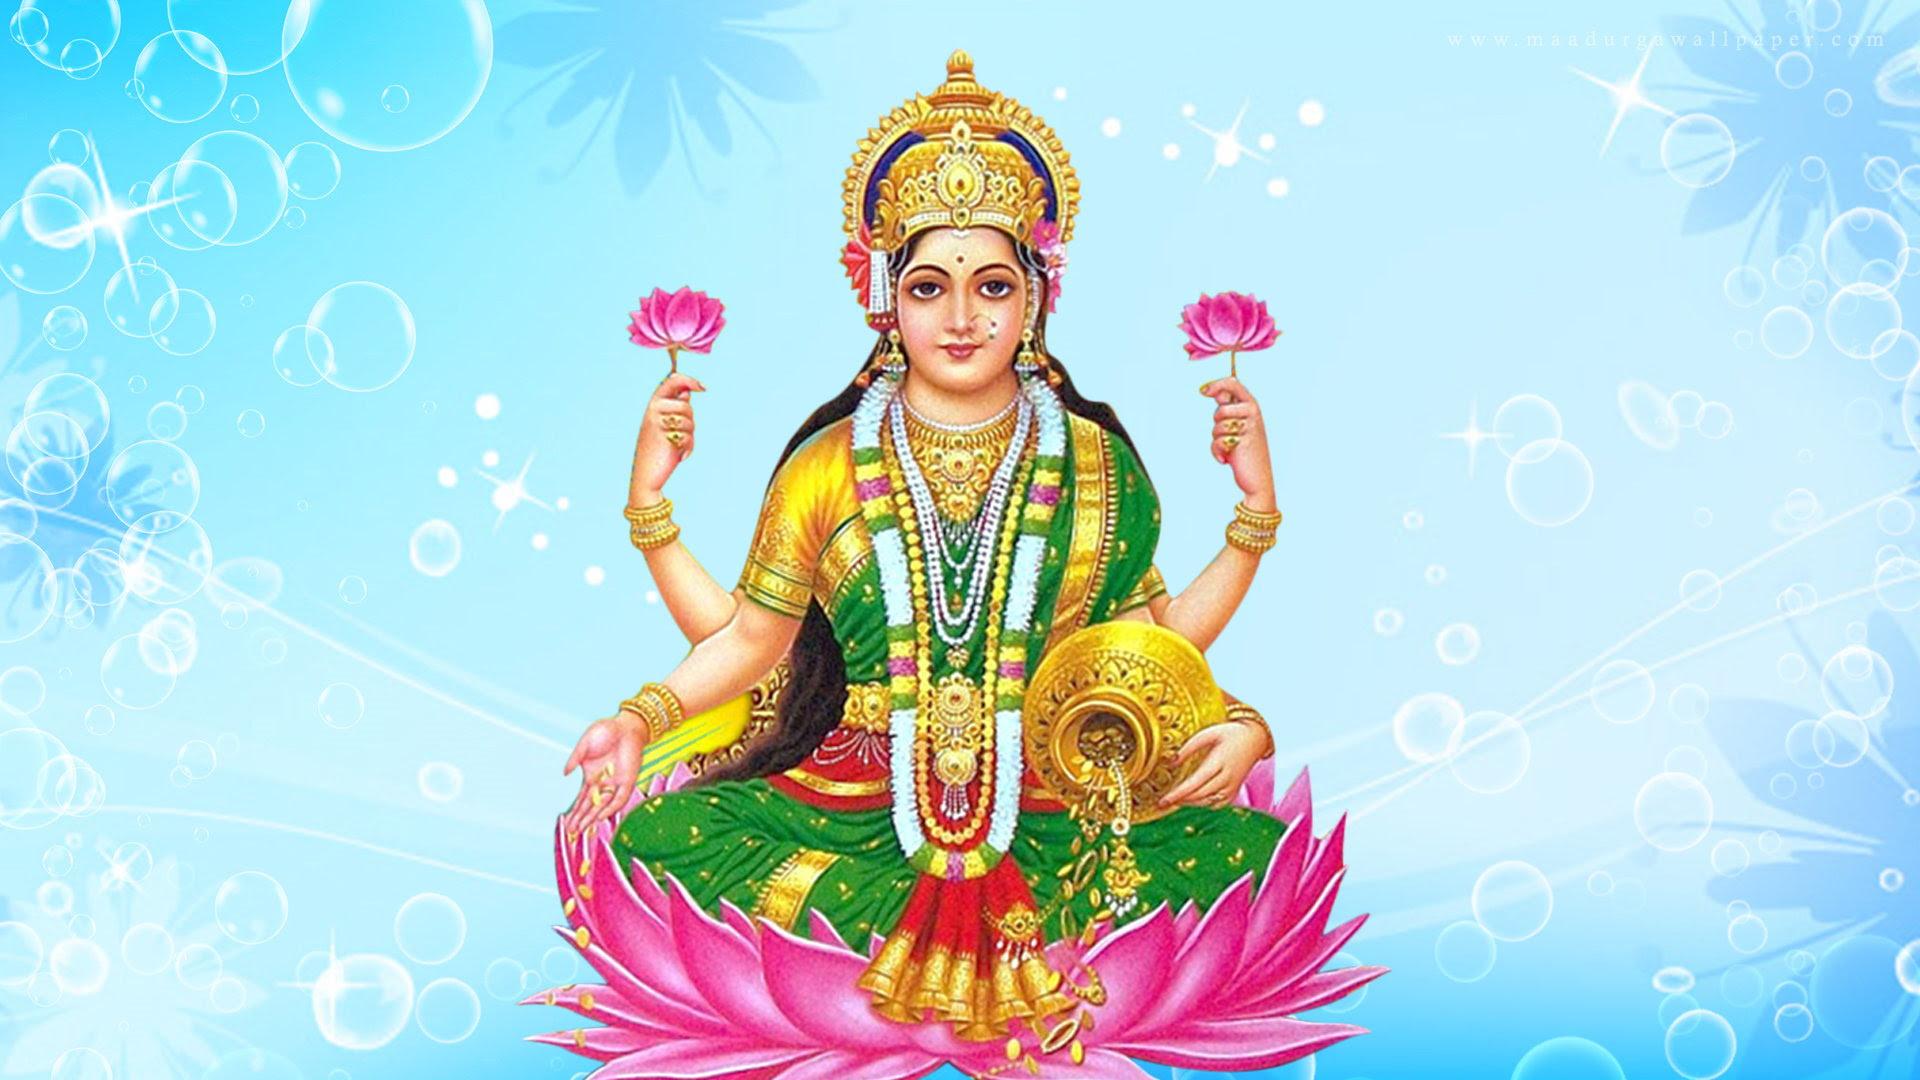 Download Free Hd Wallpapers Of Maa Laxmilakshmi Devi